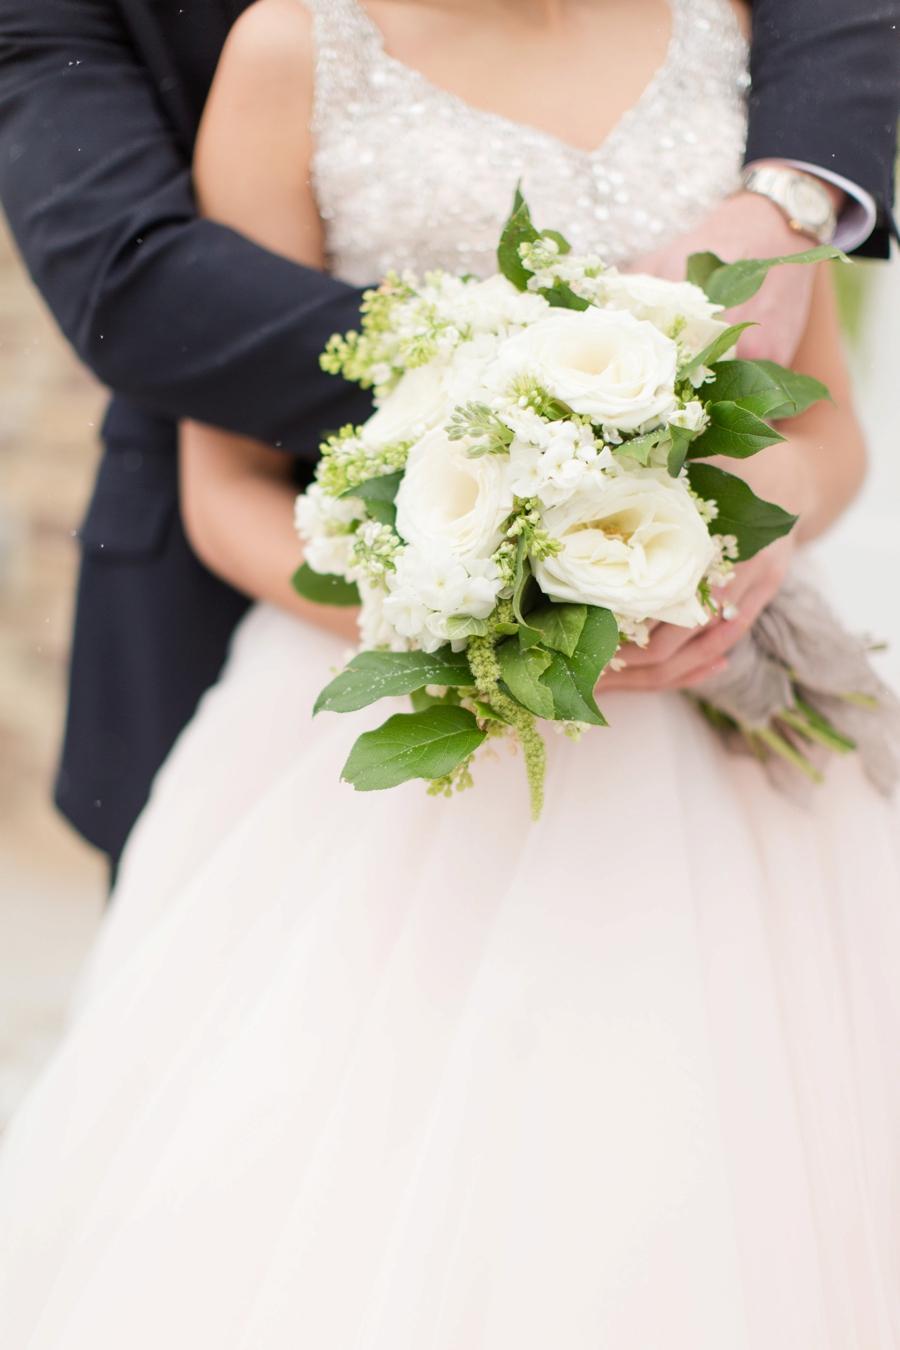 Romantic Teal, Blue, and White Wedding Ideas via TheELD.com